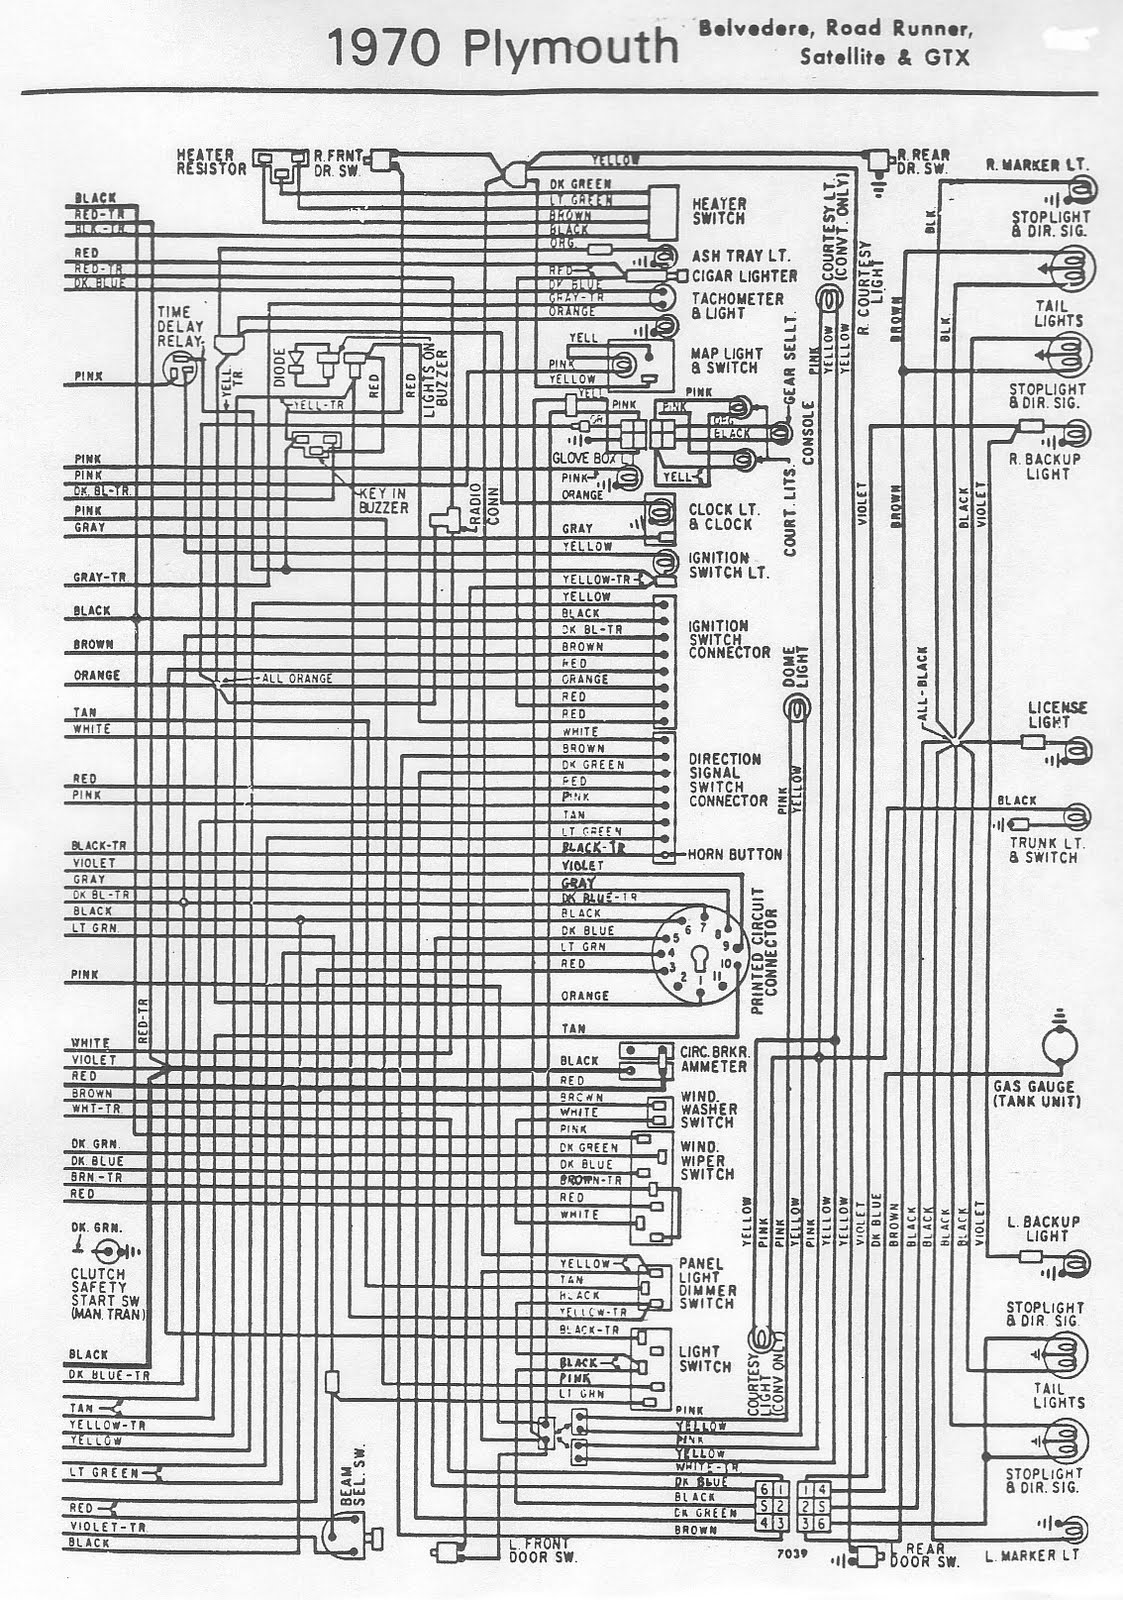 1970 Dodge Dart Ignition Wiring Diagram 2005 Nissan Xterra Rockford Fosgate Stereo Free Auto